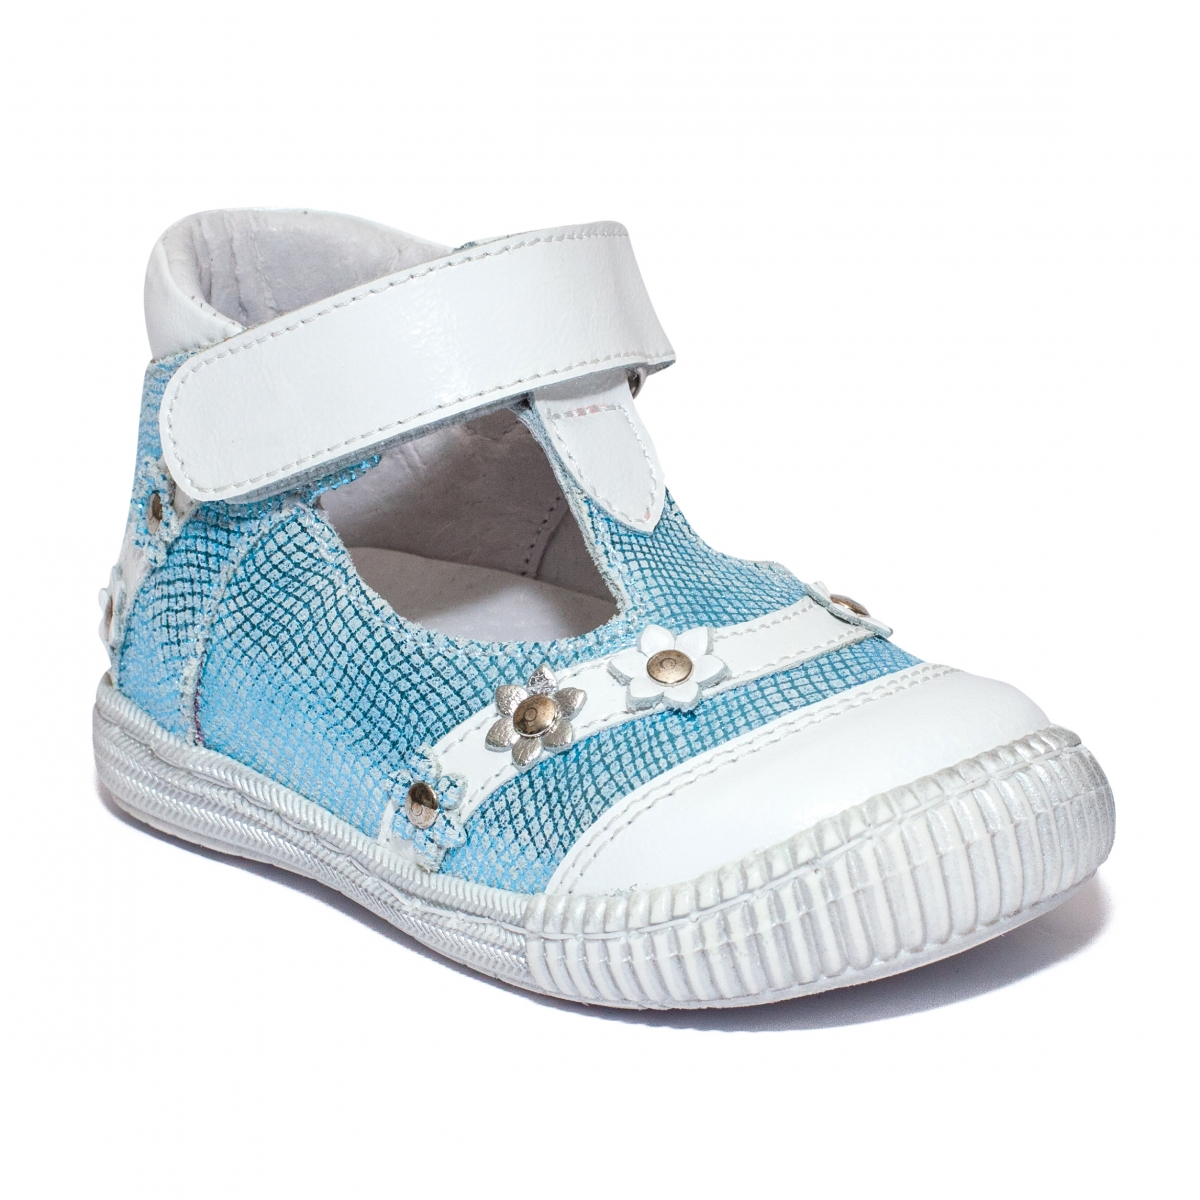 Pantofi fete inalt pe glezna 403 alb azur 18-25